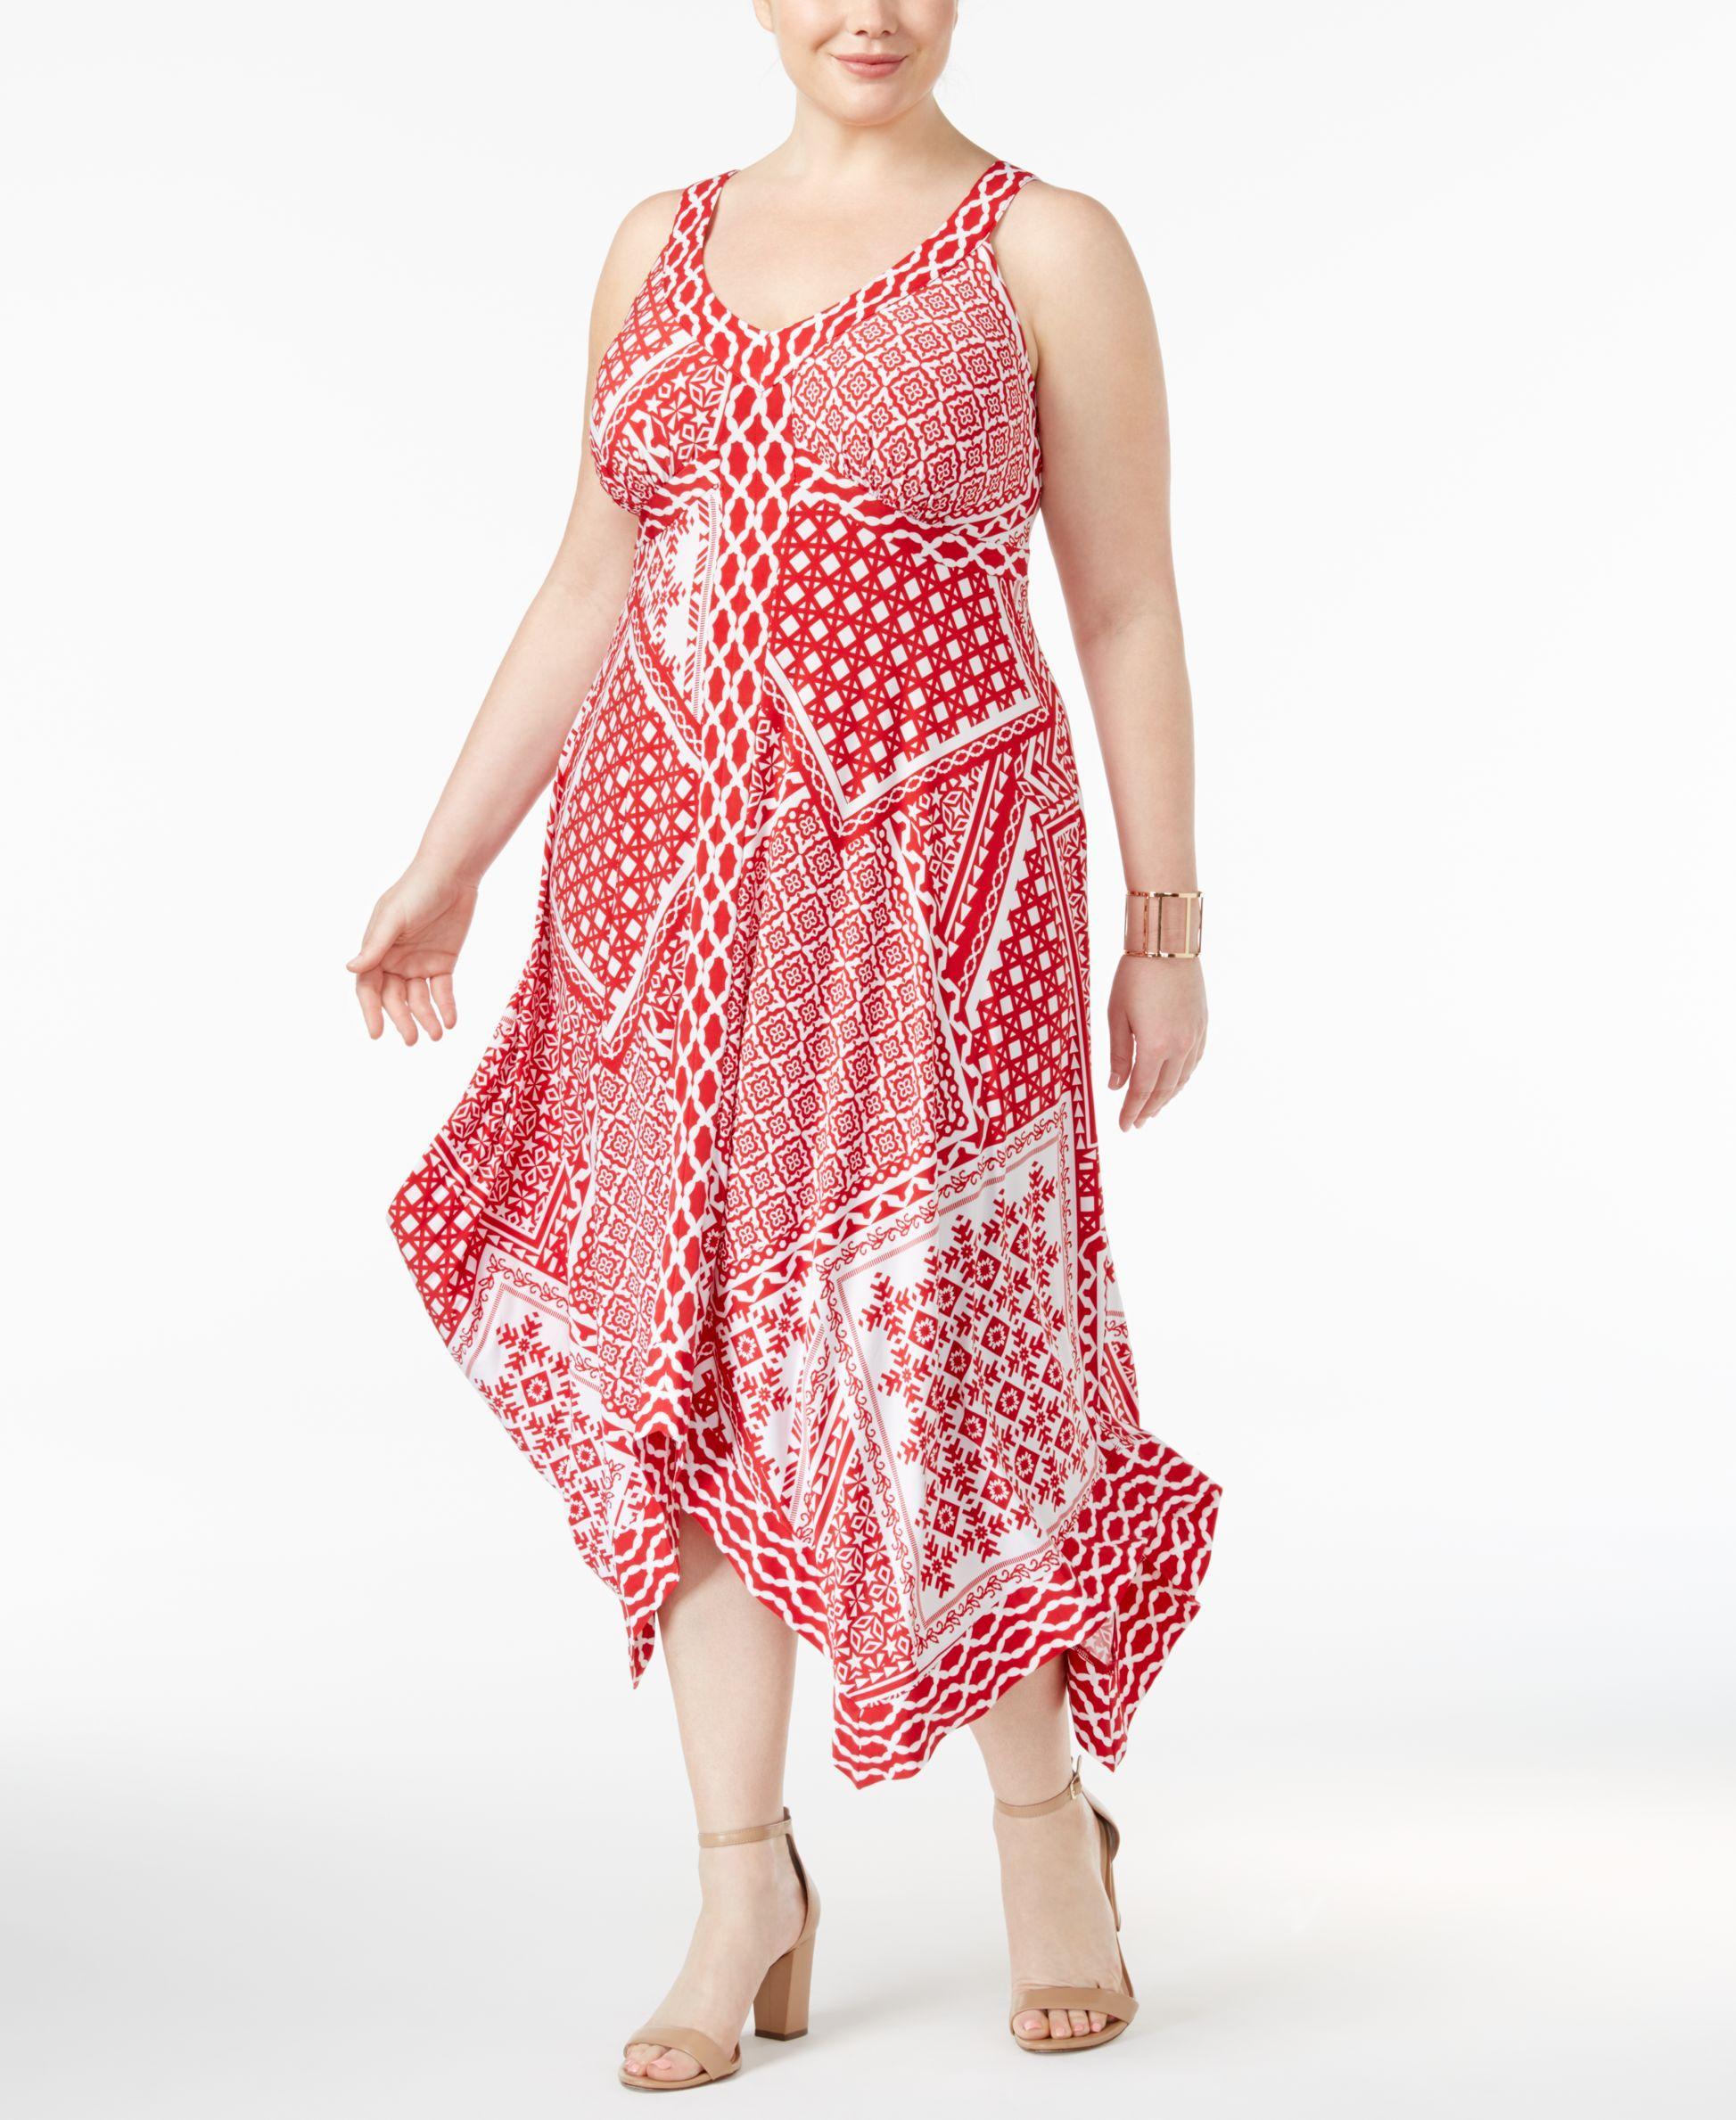 Inc International Concepts Plus Size Printed Handkerchief-Hem Dress, Only at Macy's